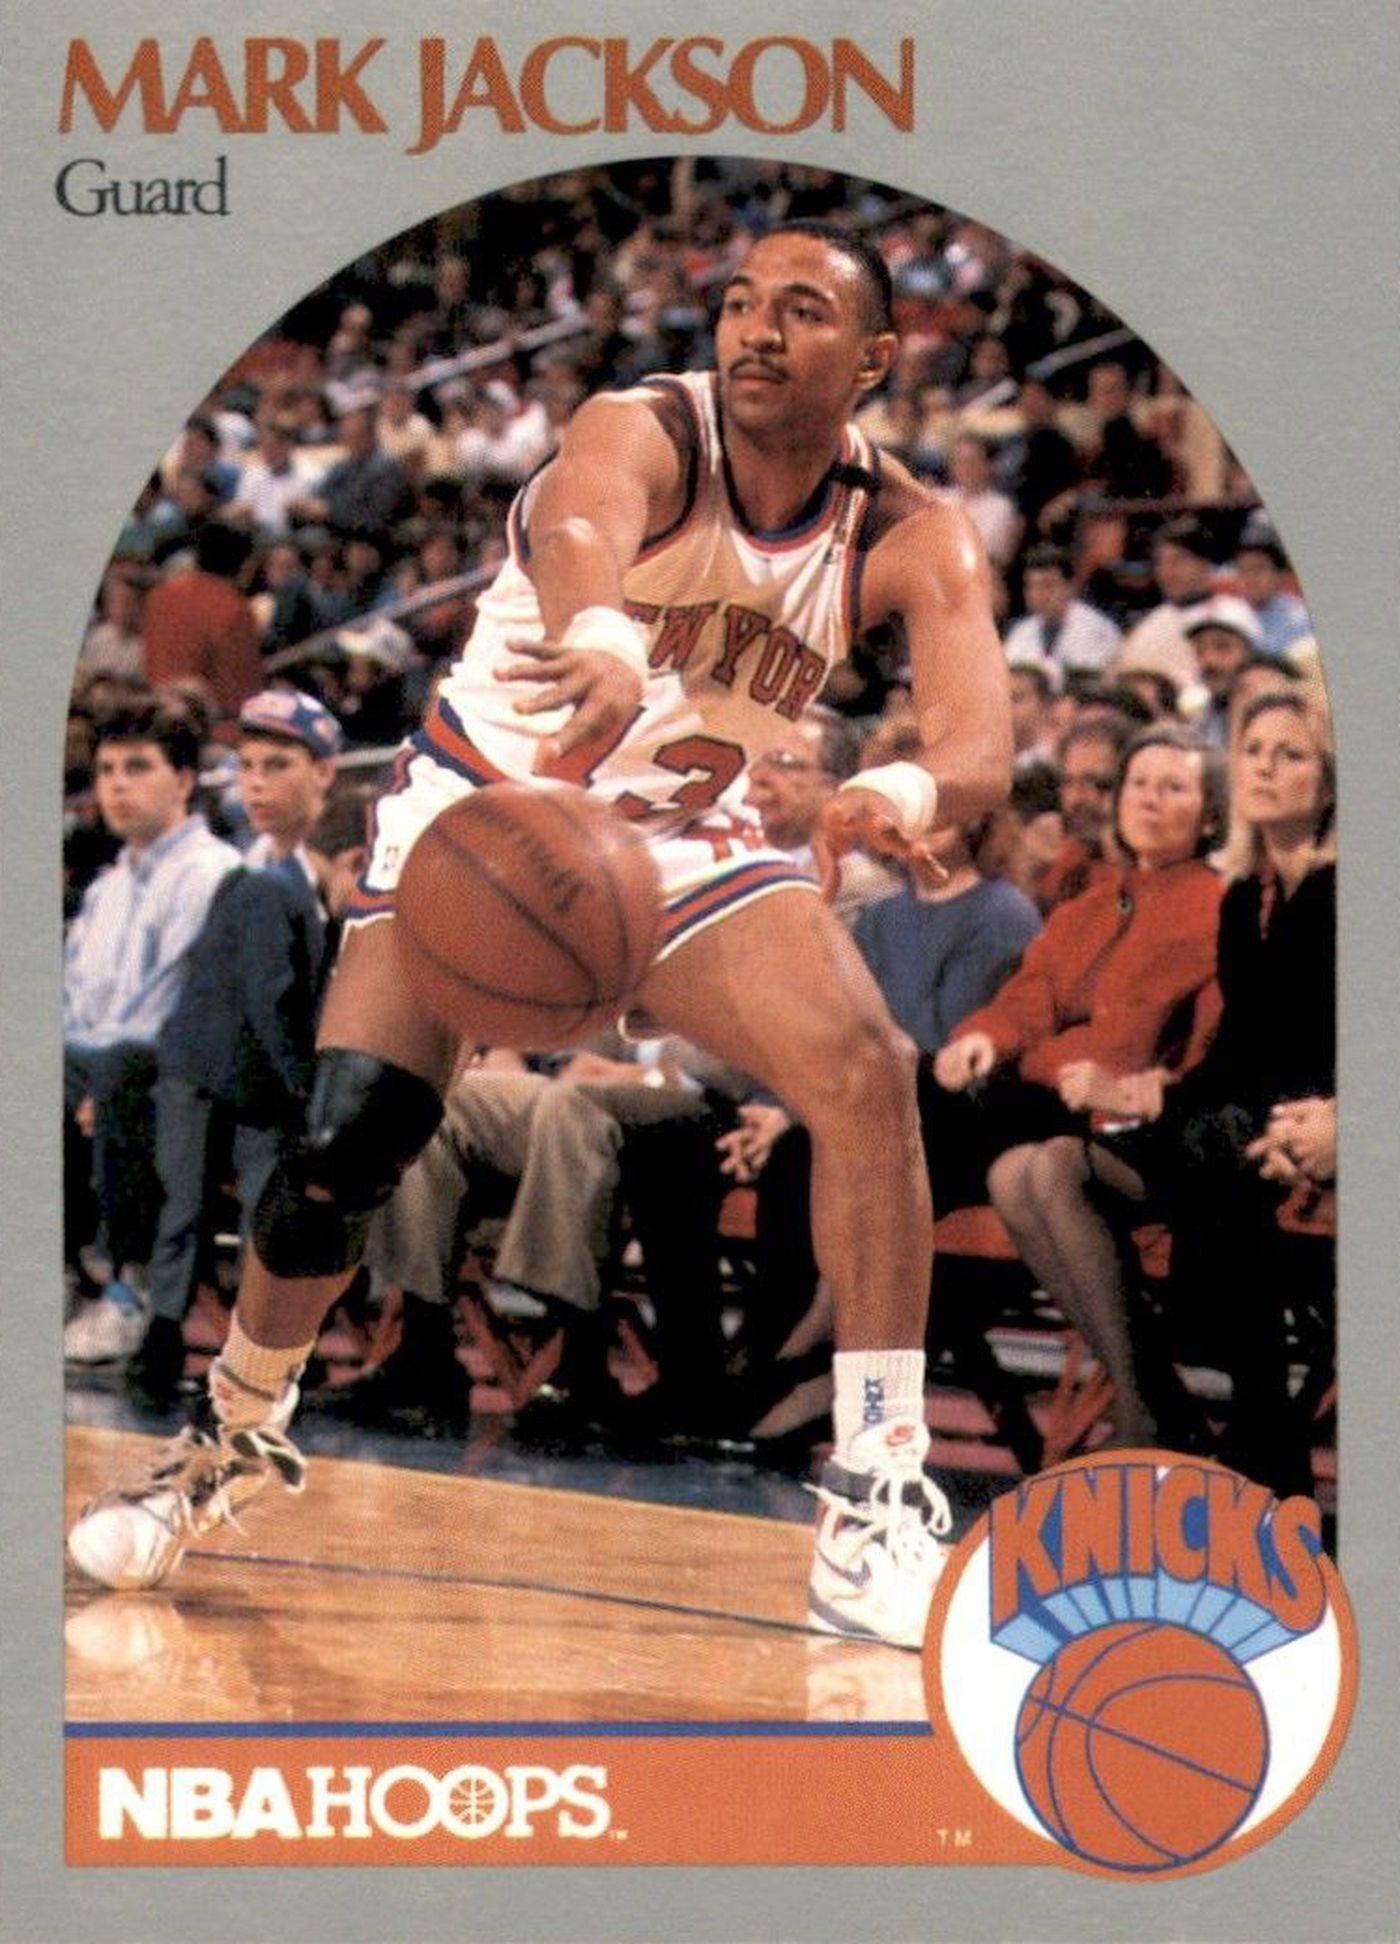 Ebay Pulls Basketball Card That Appears To Show Killer Menendez